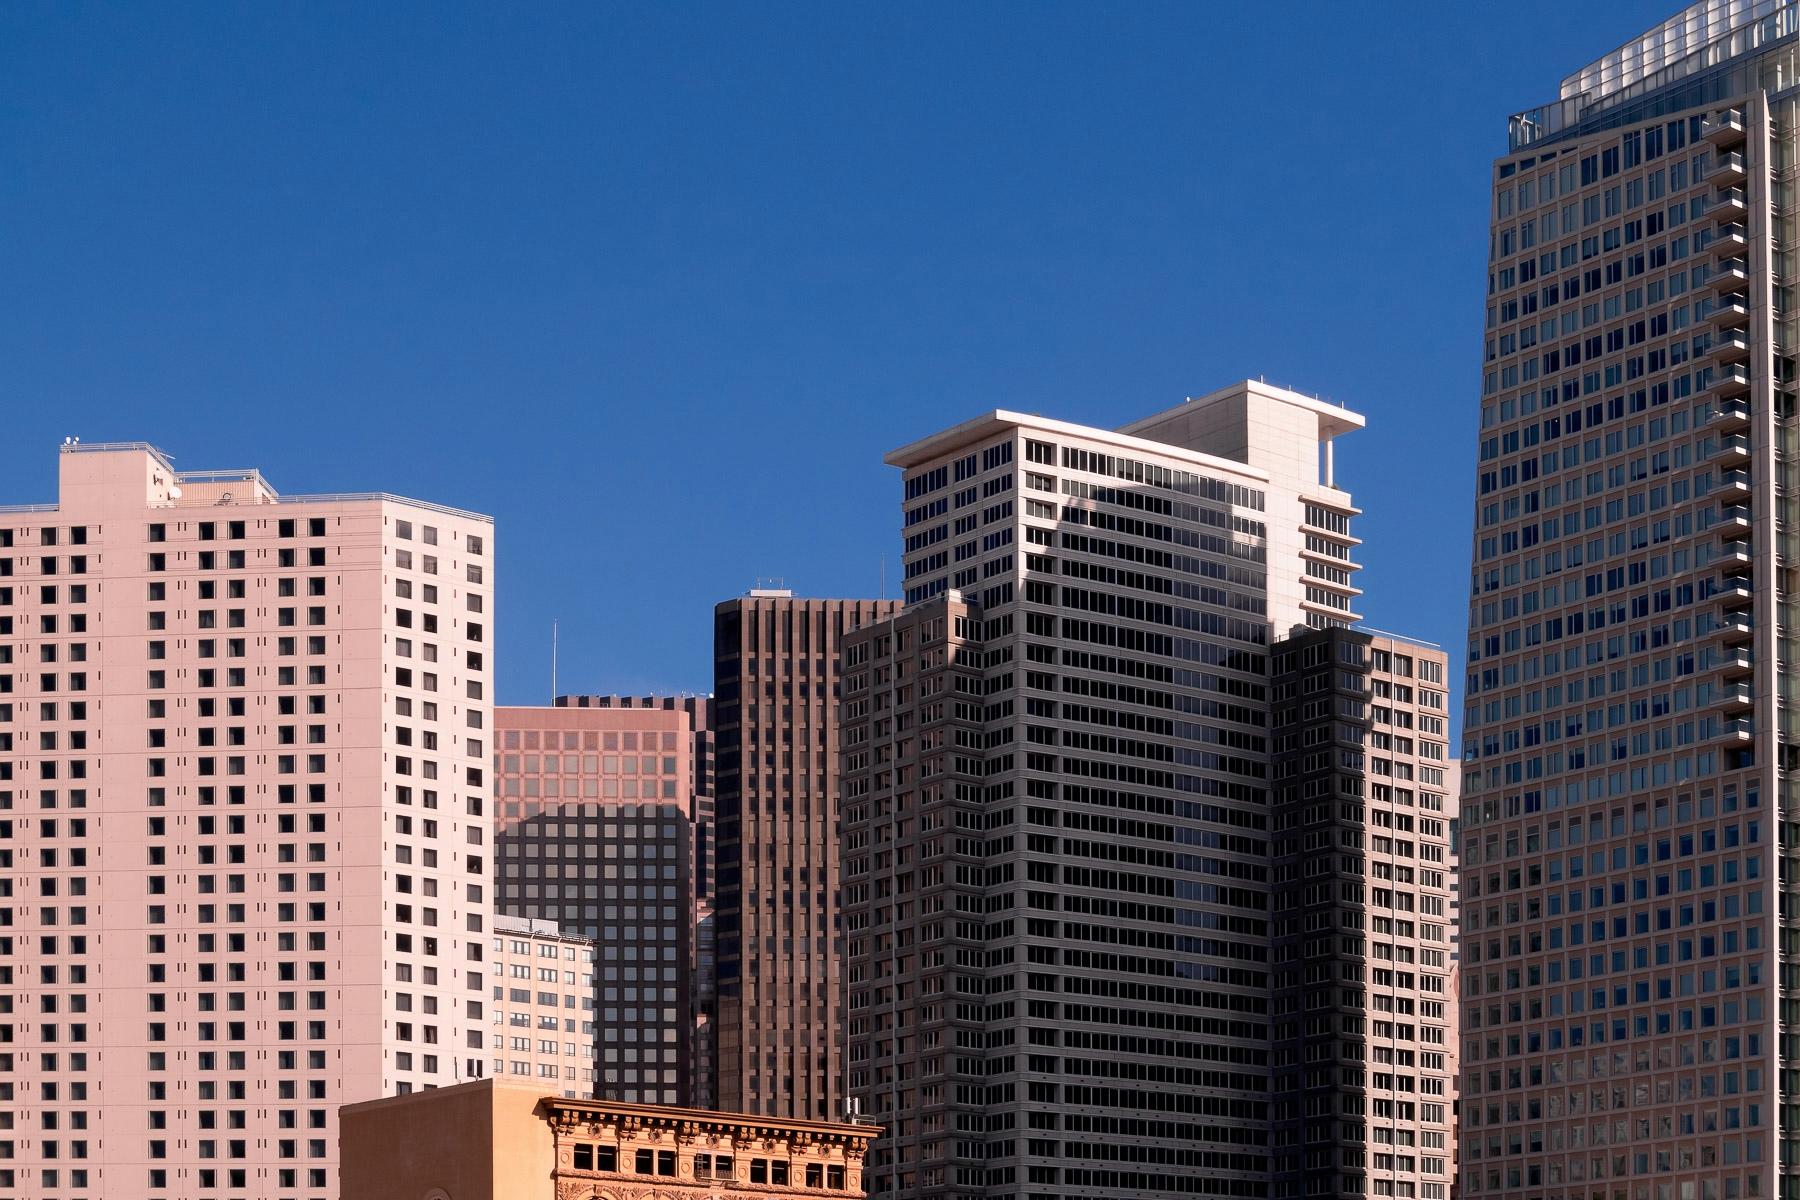 San Francisco Skyscrapers rise  - mattgharvey   ello